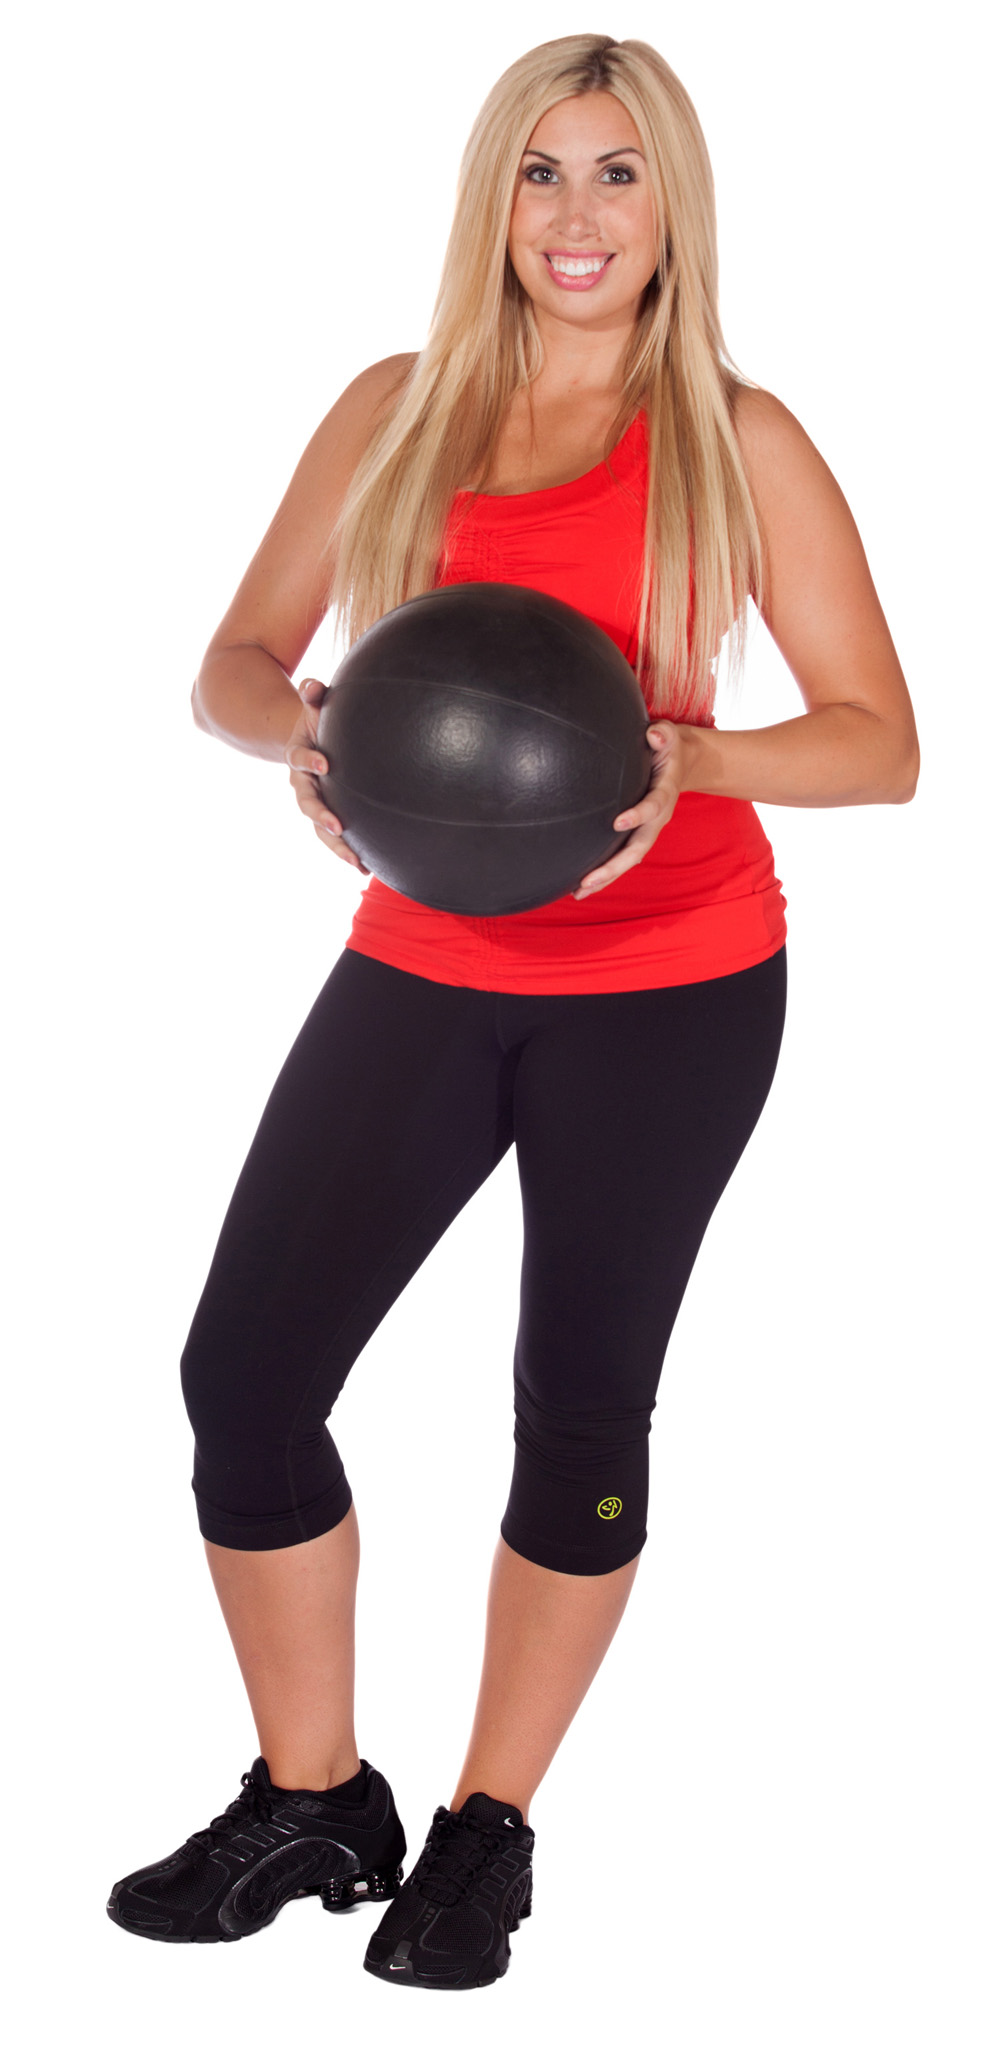 phoebe-flannagan-with-ball-40-below-fitness-center-fairbanks-ak-151-web.jpg